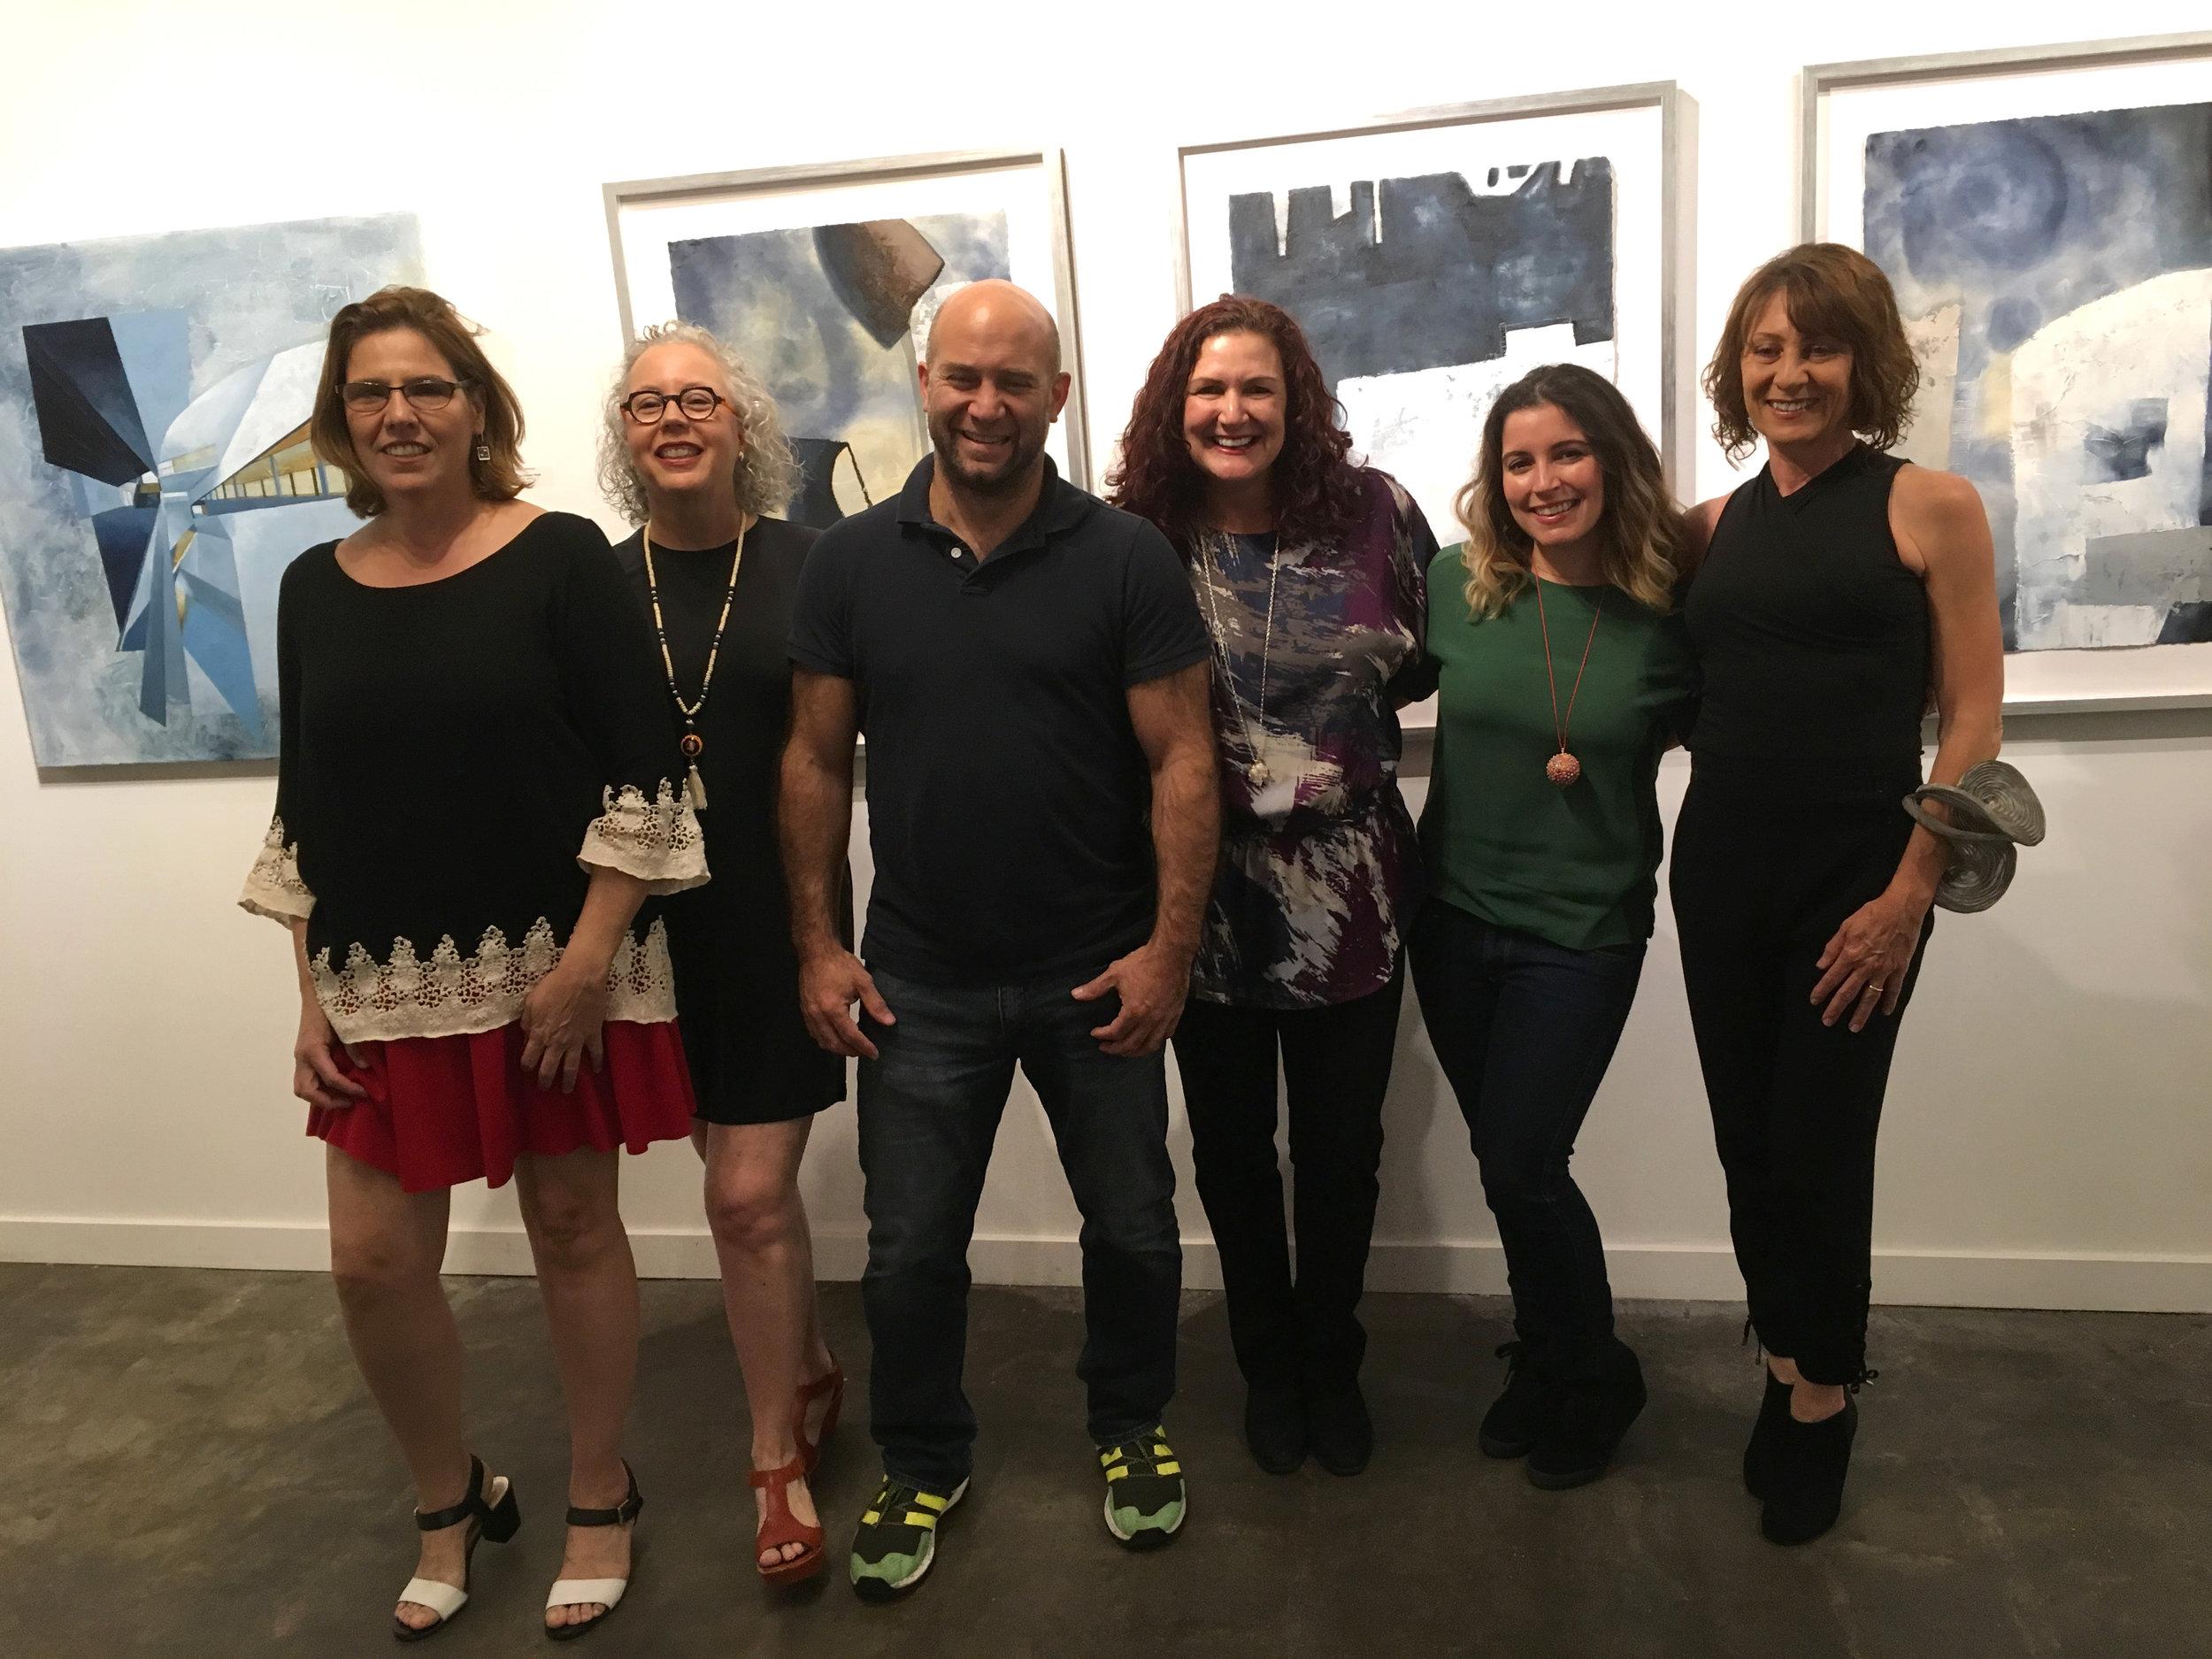 My artist friends! From left to right Carolina Otero Pardo, Luisa Duarte. Verny Sanchez, Lorena Morales, Moi, Mariana Sammartino.